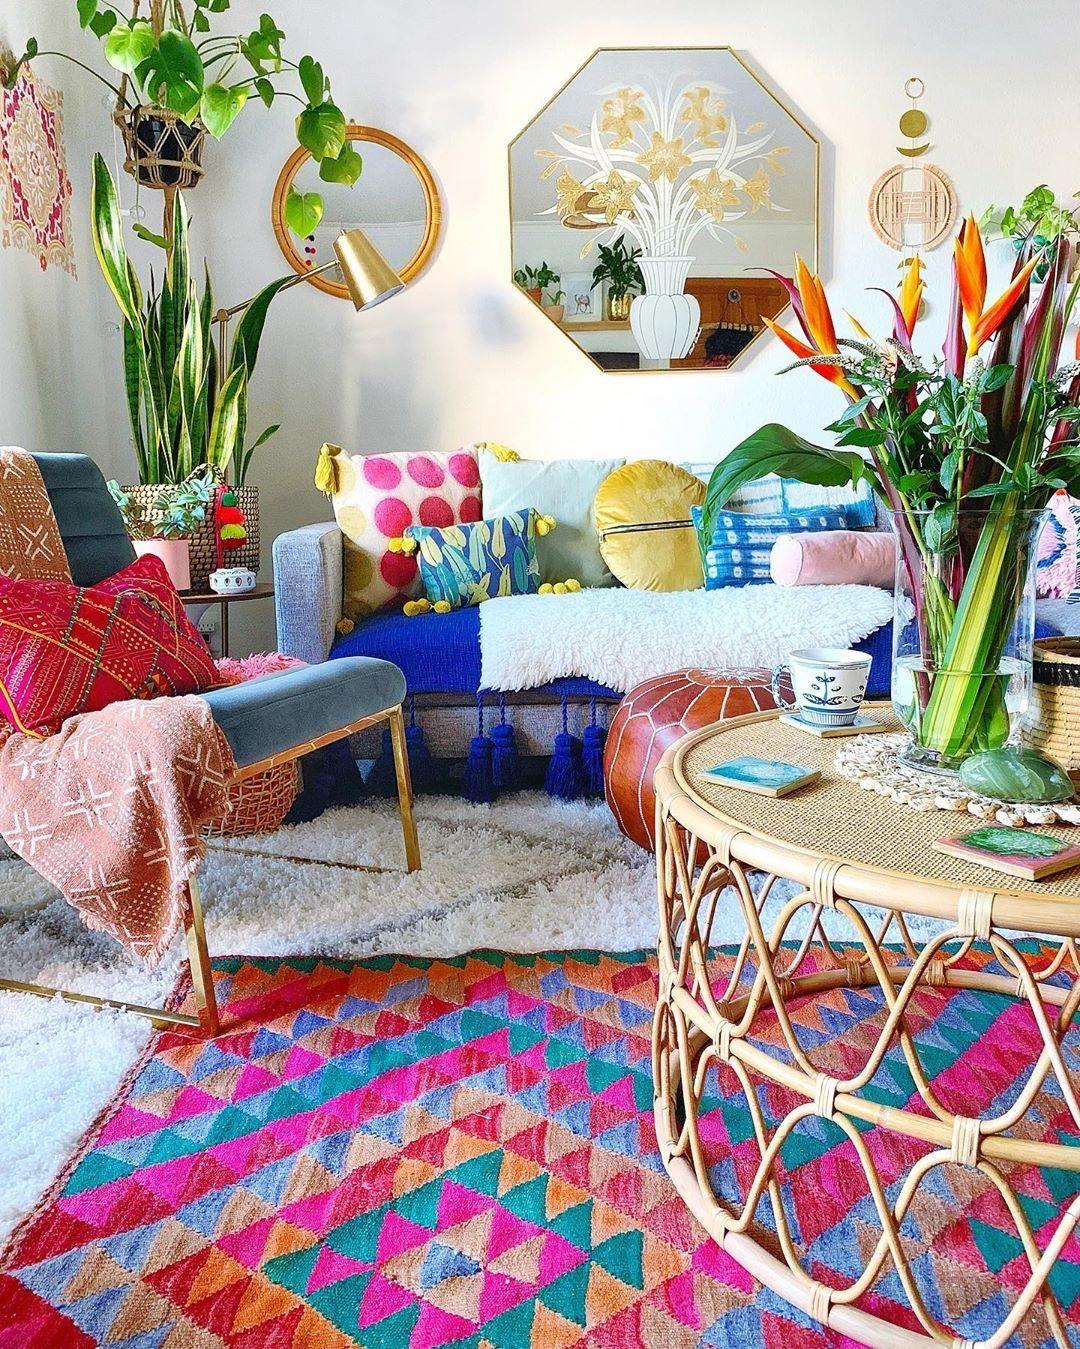 Bohemian Latest And Stylish Home Decor Design And Life Style Ideas Home Decor Rooms Home Decor Stylish Home Decor Gypsy living room decor